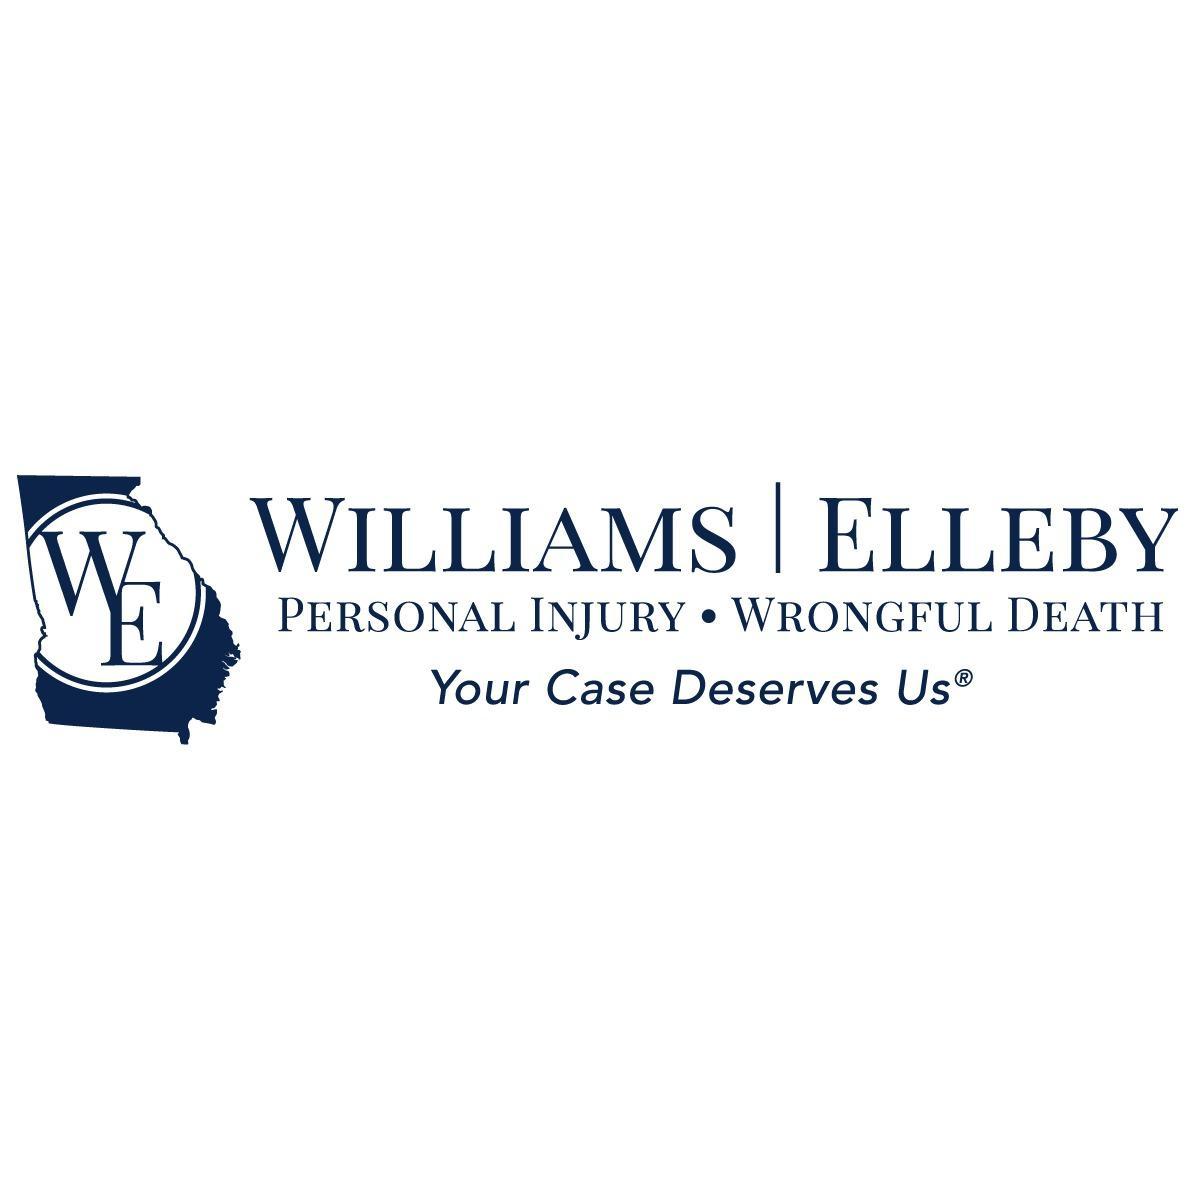 WILLIAMS ELLEBY